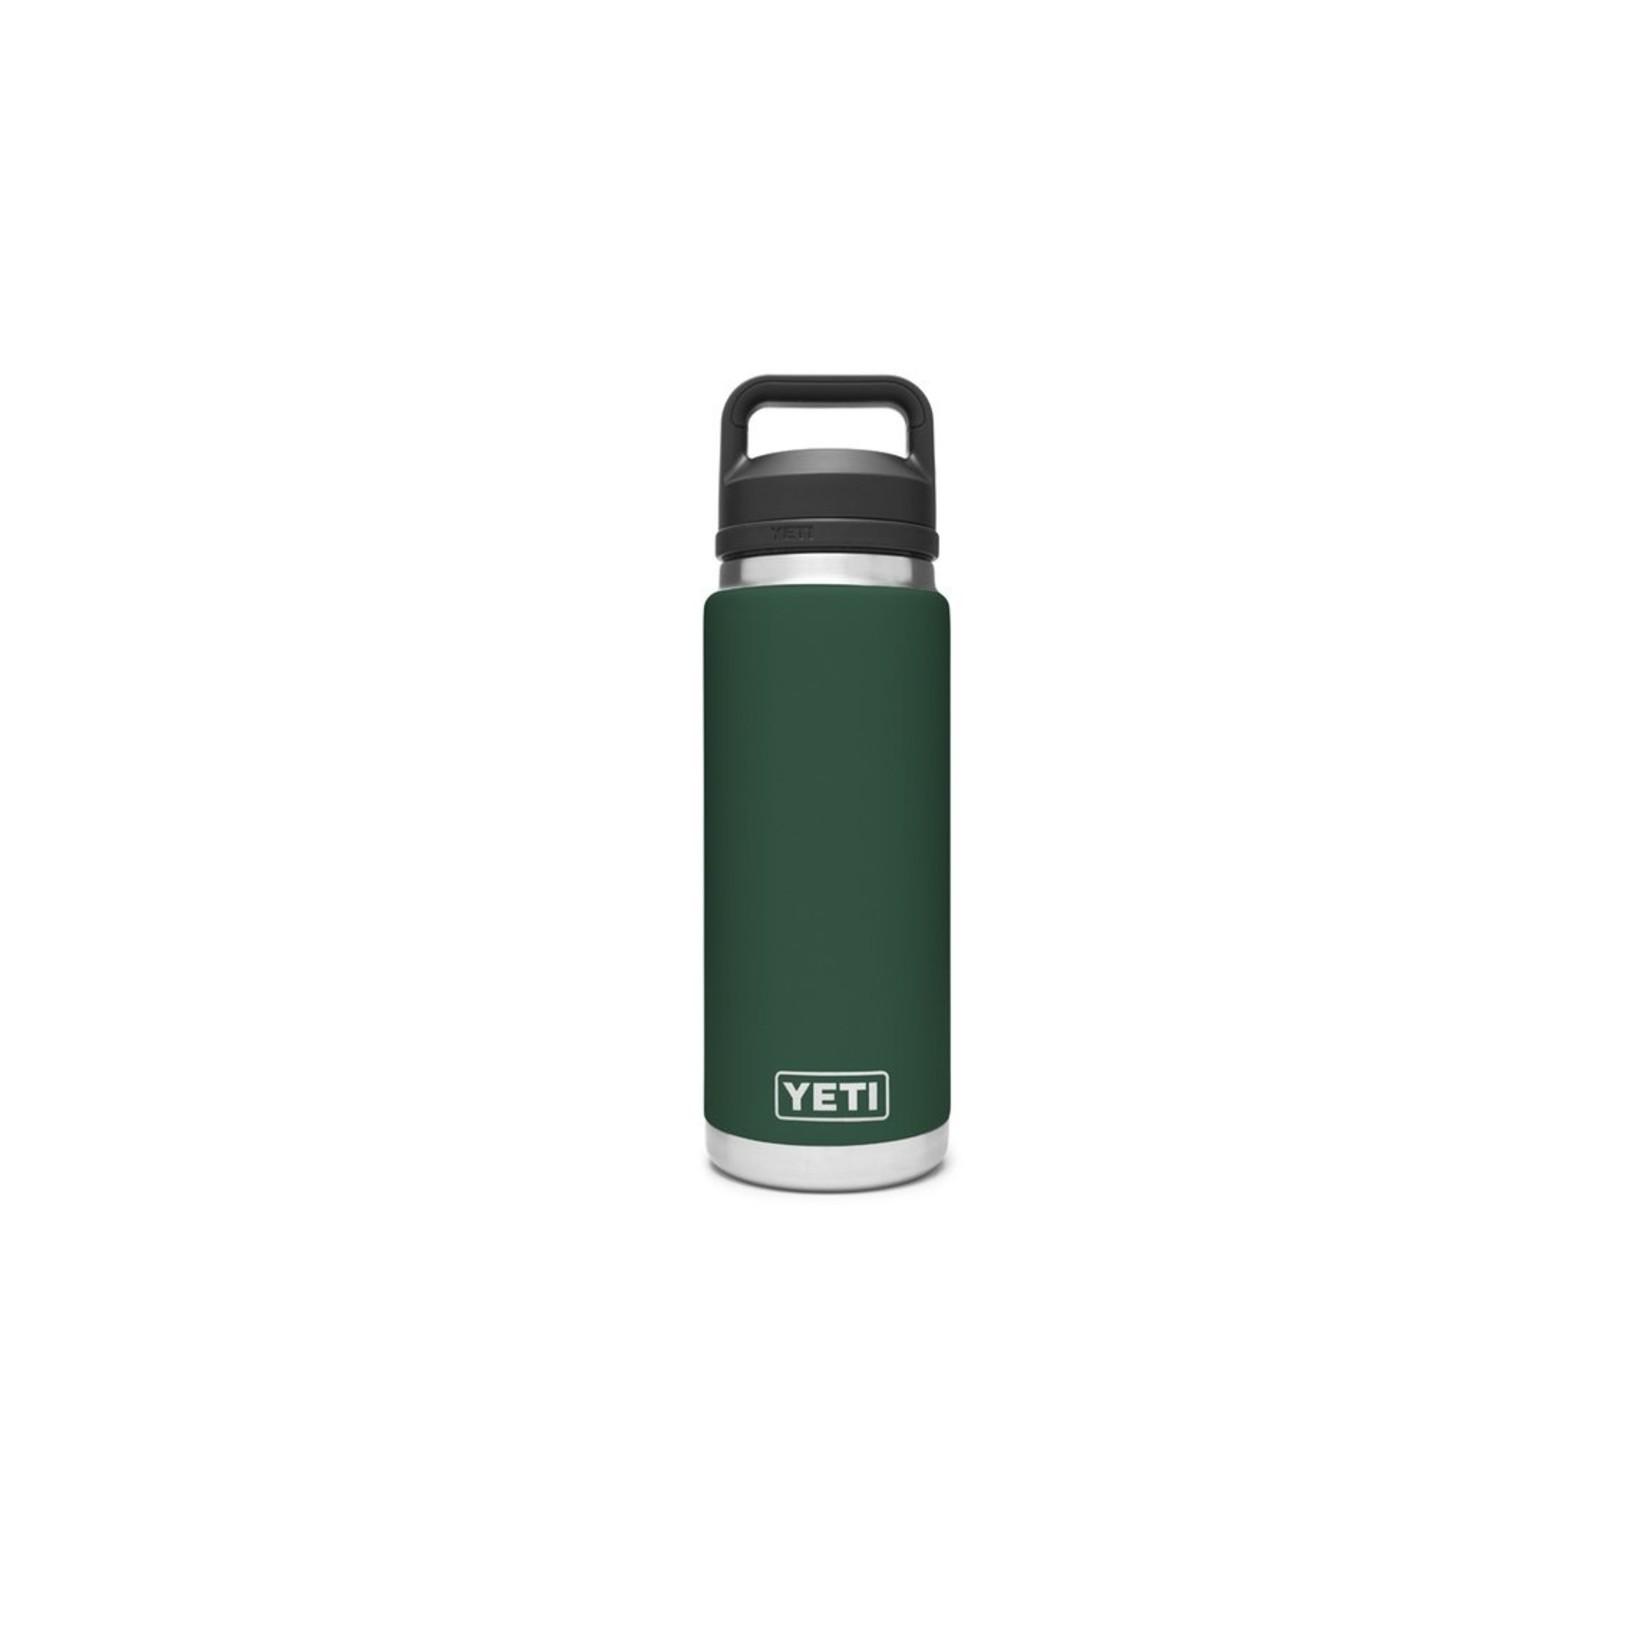 Yeti Yeti Rambler 26 Oz Bottle Chug